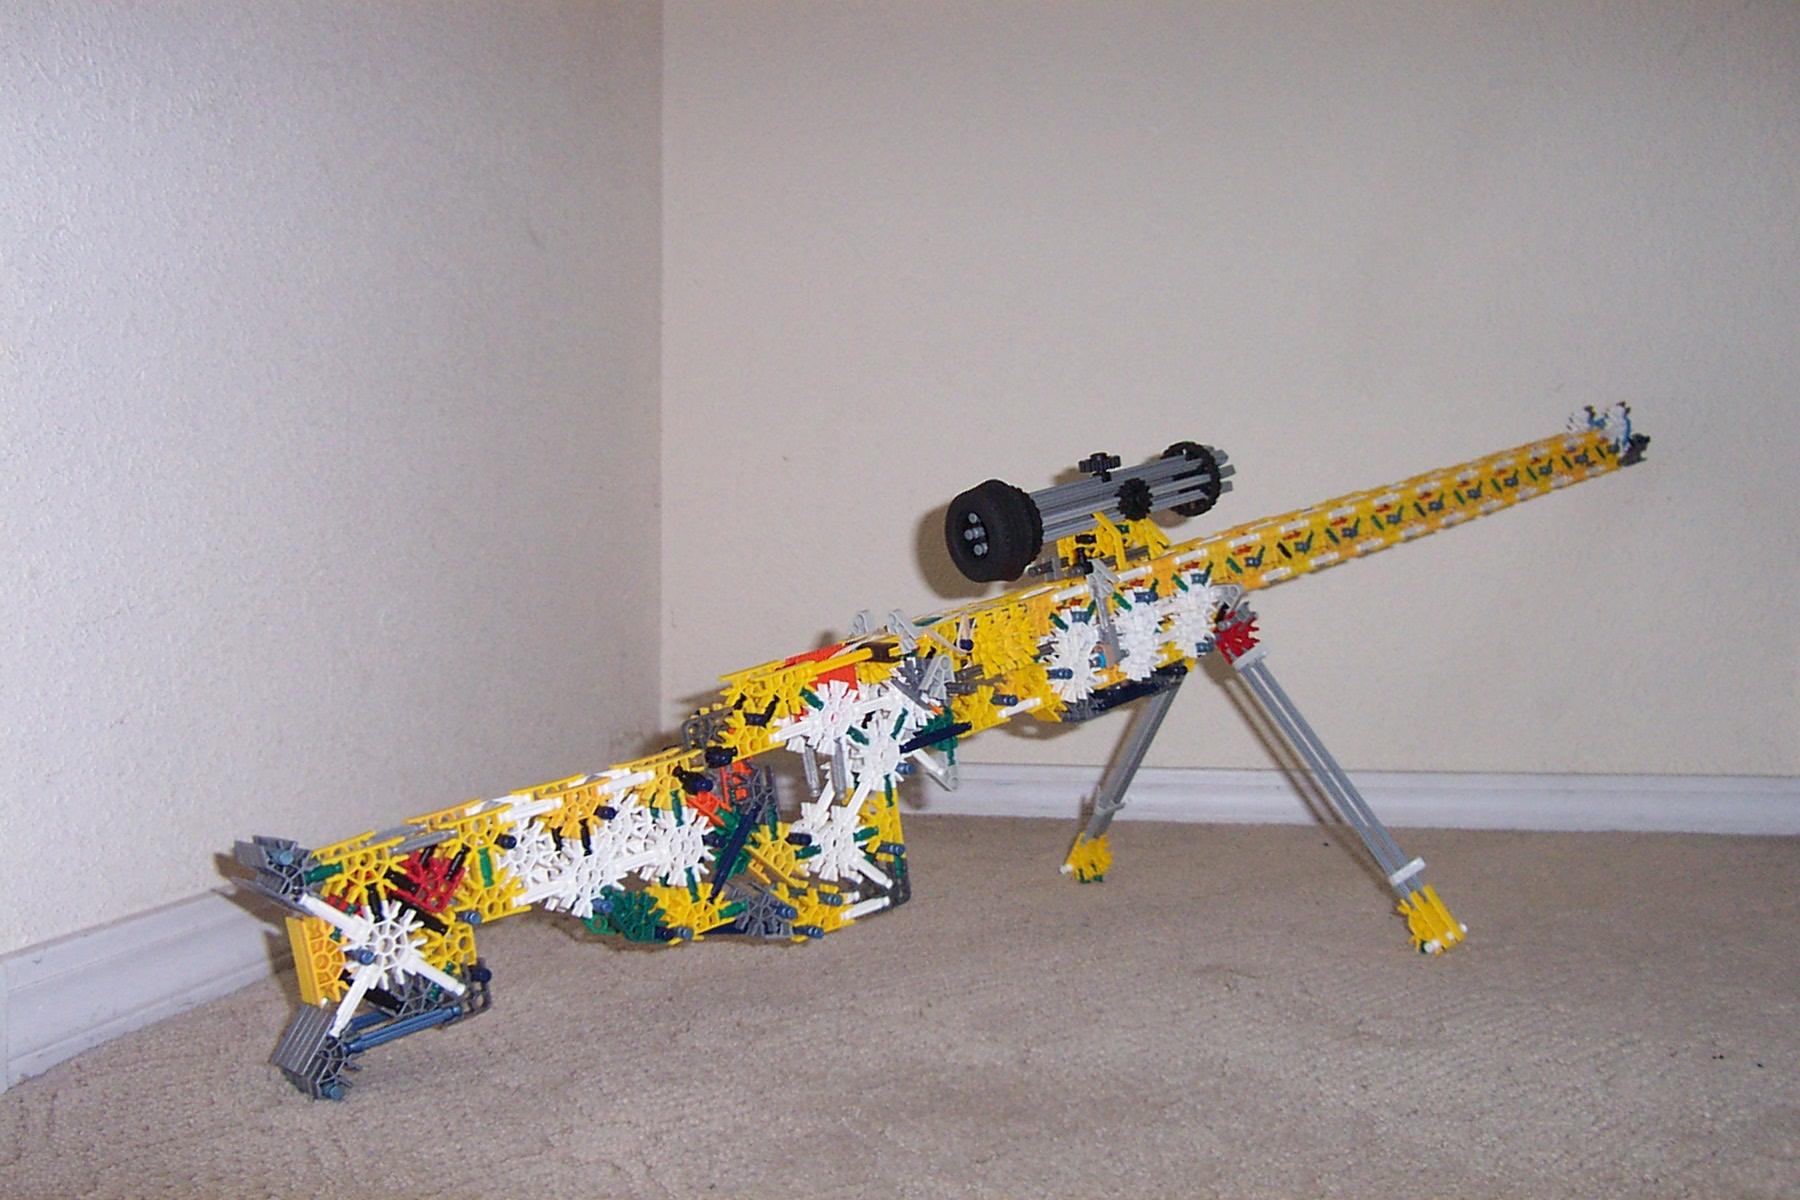 l96a1 sniper rifle